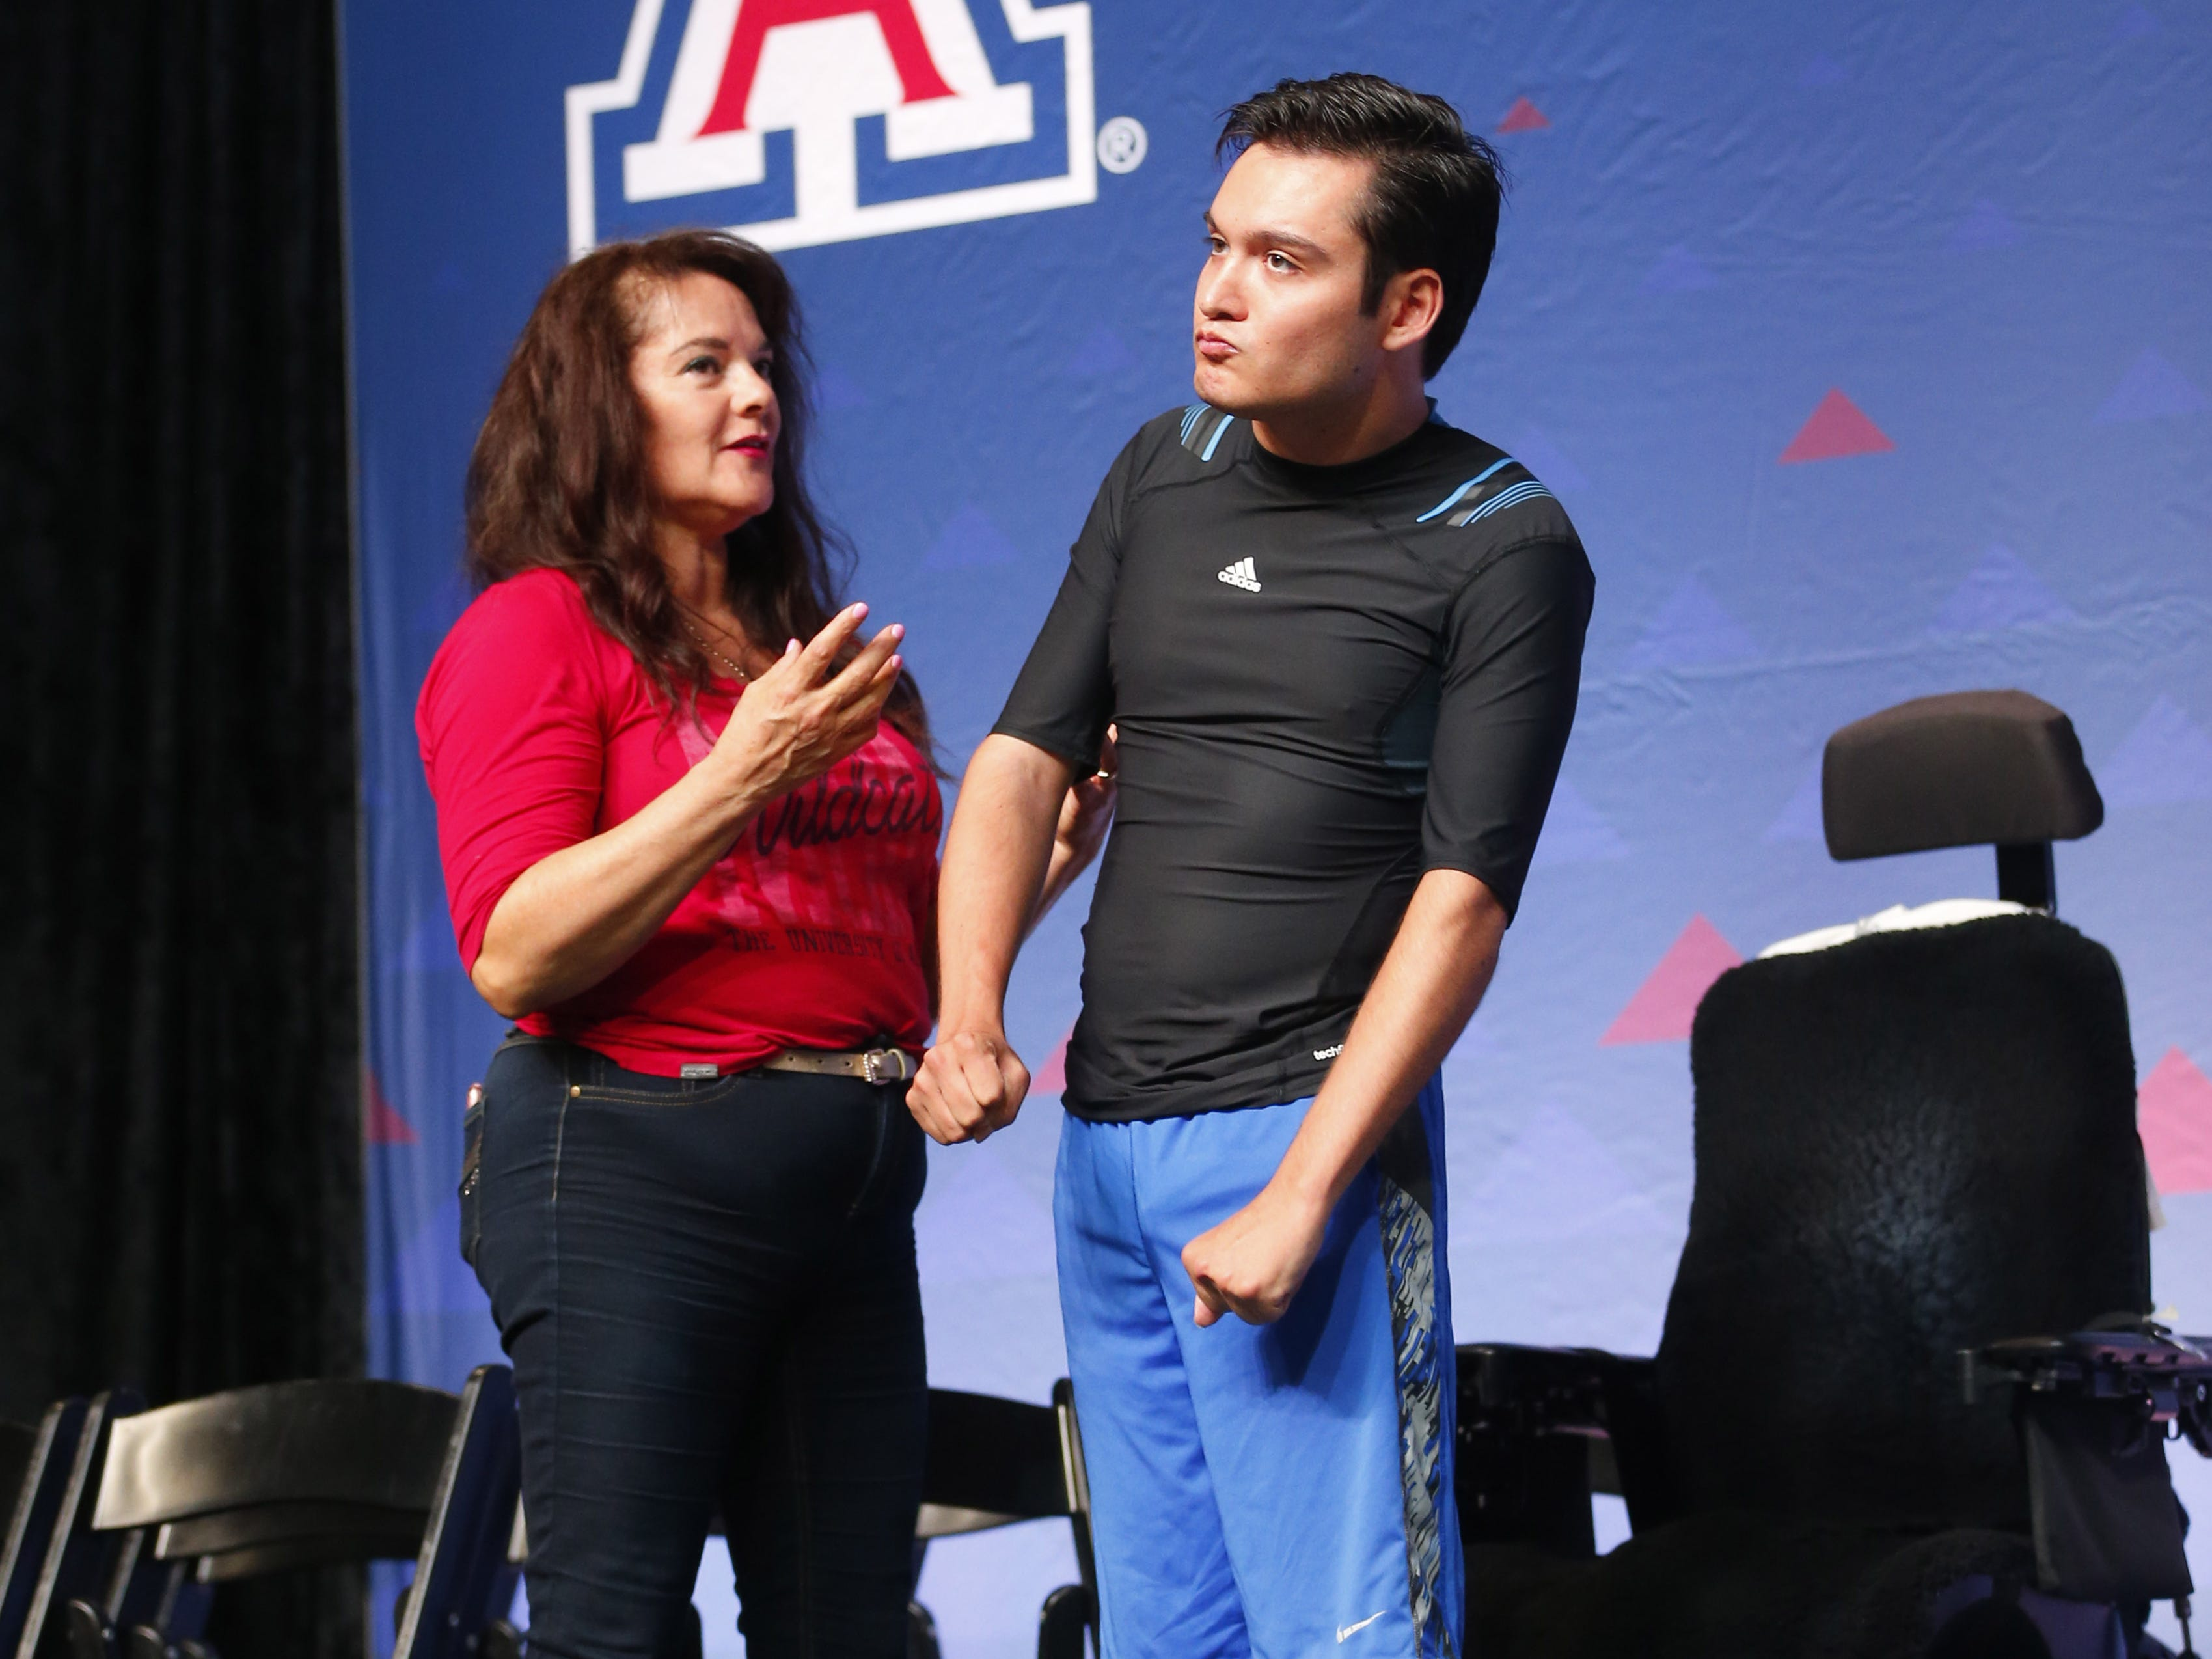 University of Arizona graduate Jeffrey Bristol practices walking on stage with his mom, Hermelinda, at McKale Center in Tucson, Ariz. on May 8, 2019.